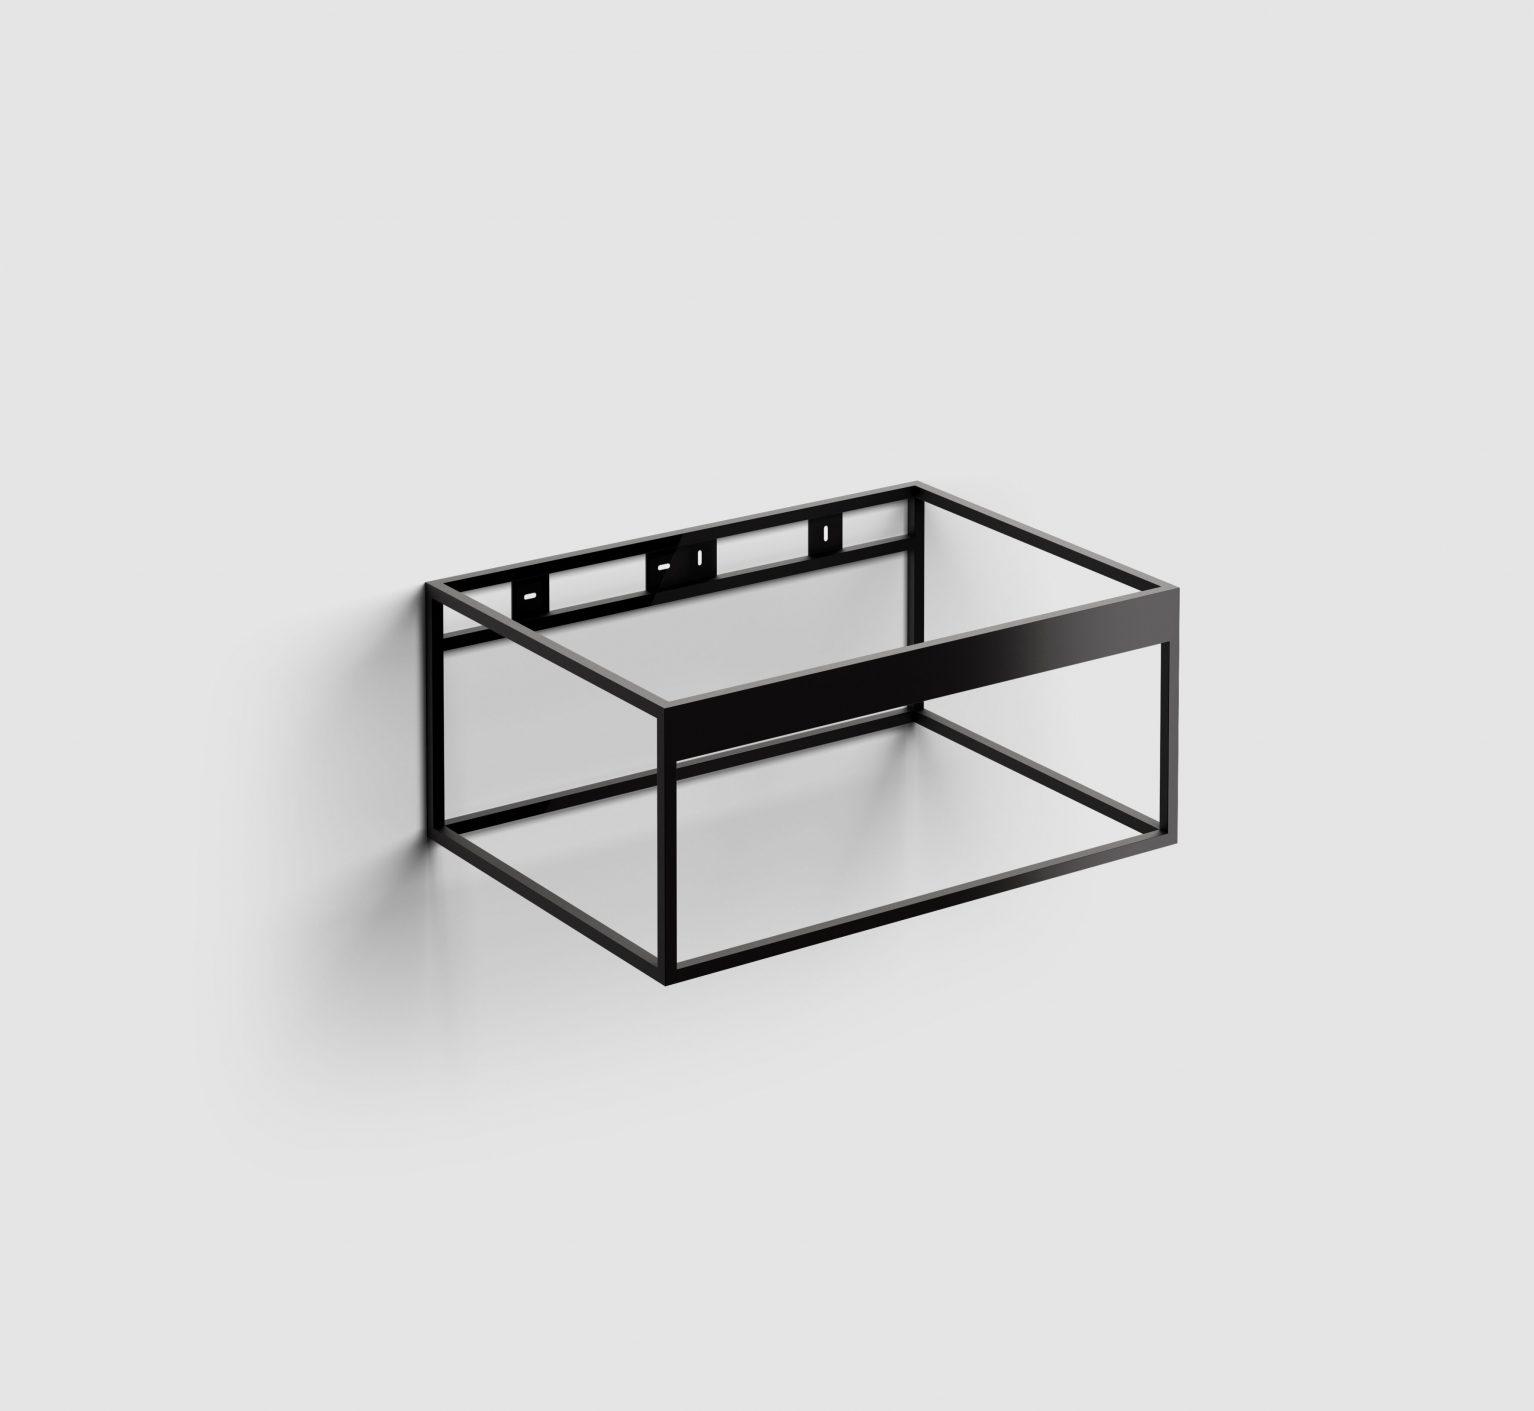 Hammock Frame rvs kokerprofielkast 70 cm, mat zwart poederc.)